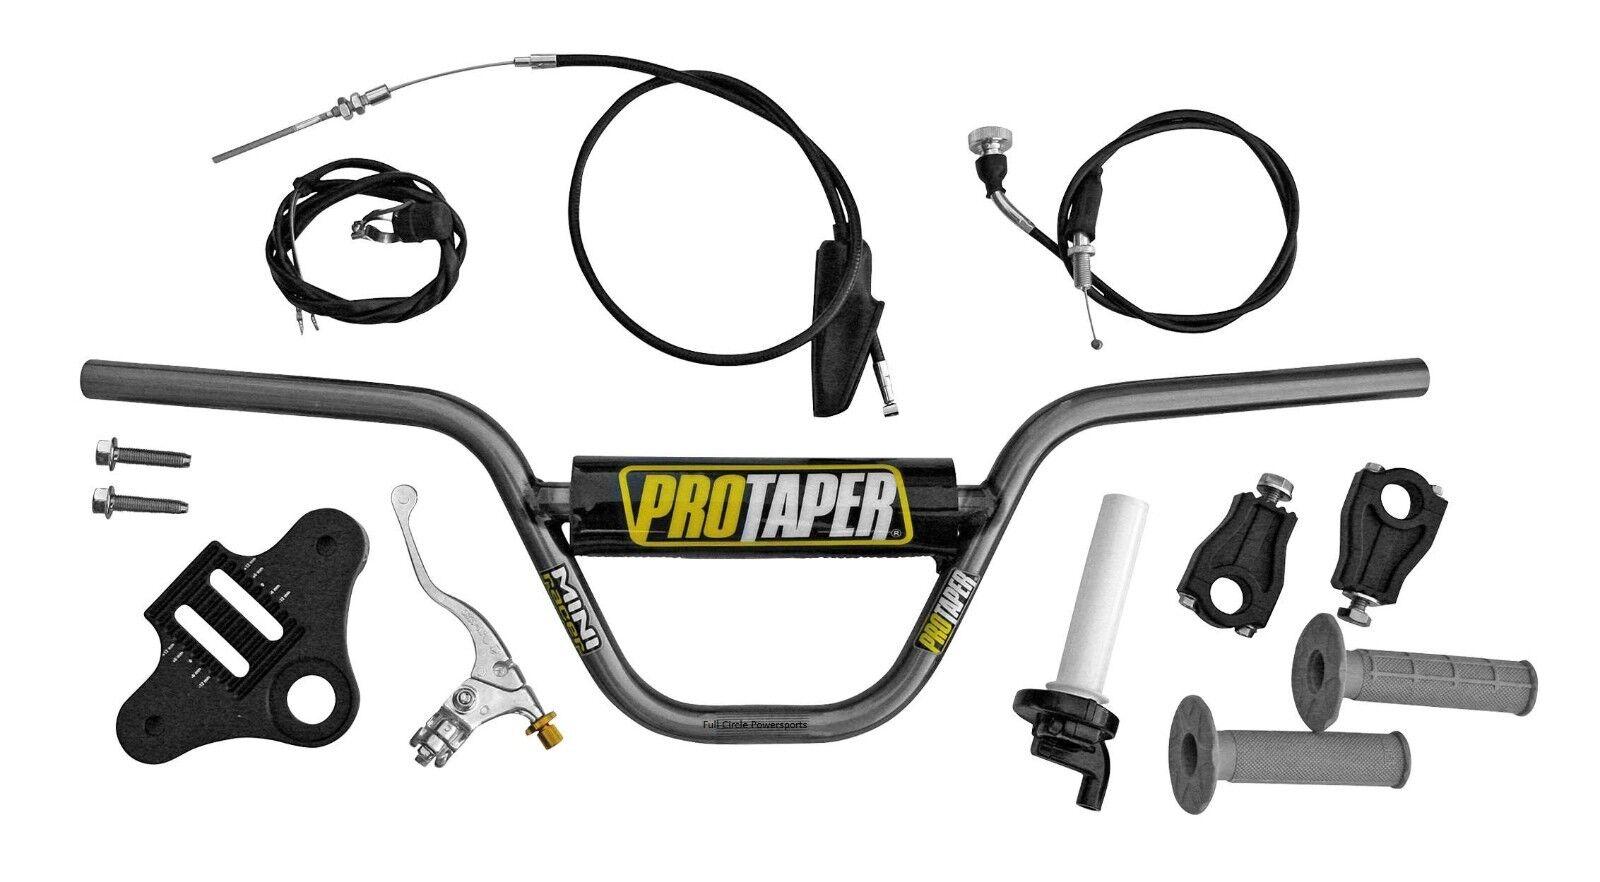 Pro Taper Chomoly Handlebar Kit Honda CRF50 XR50 Upper